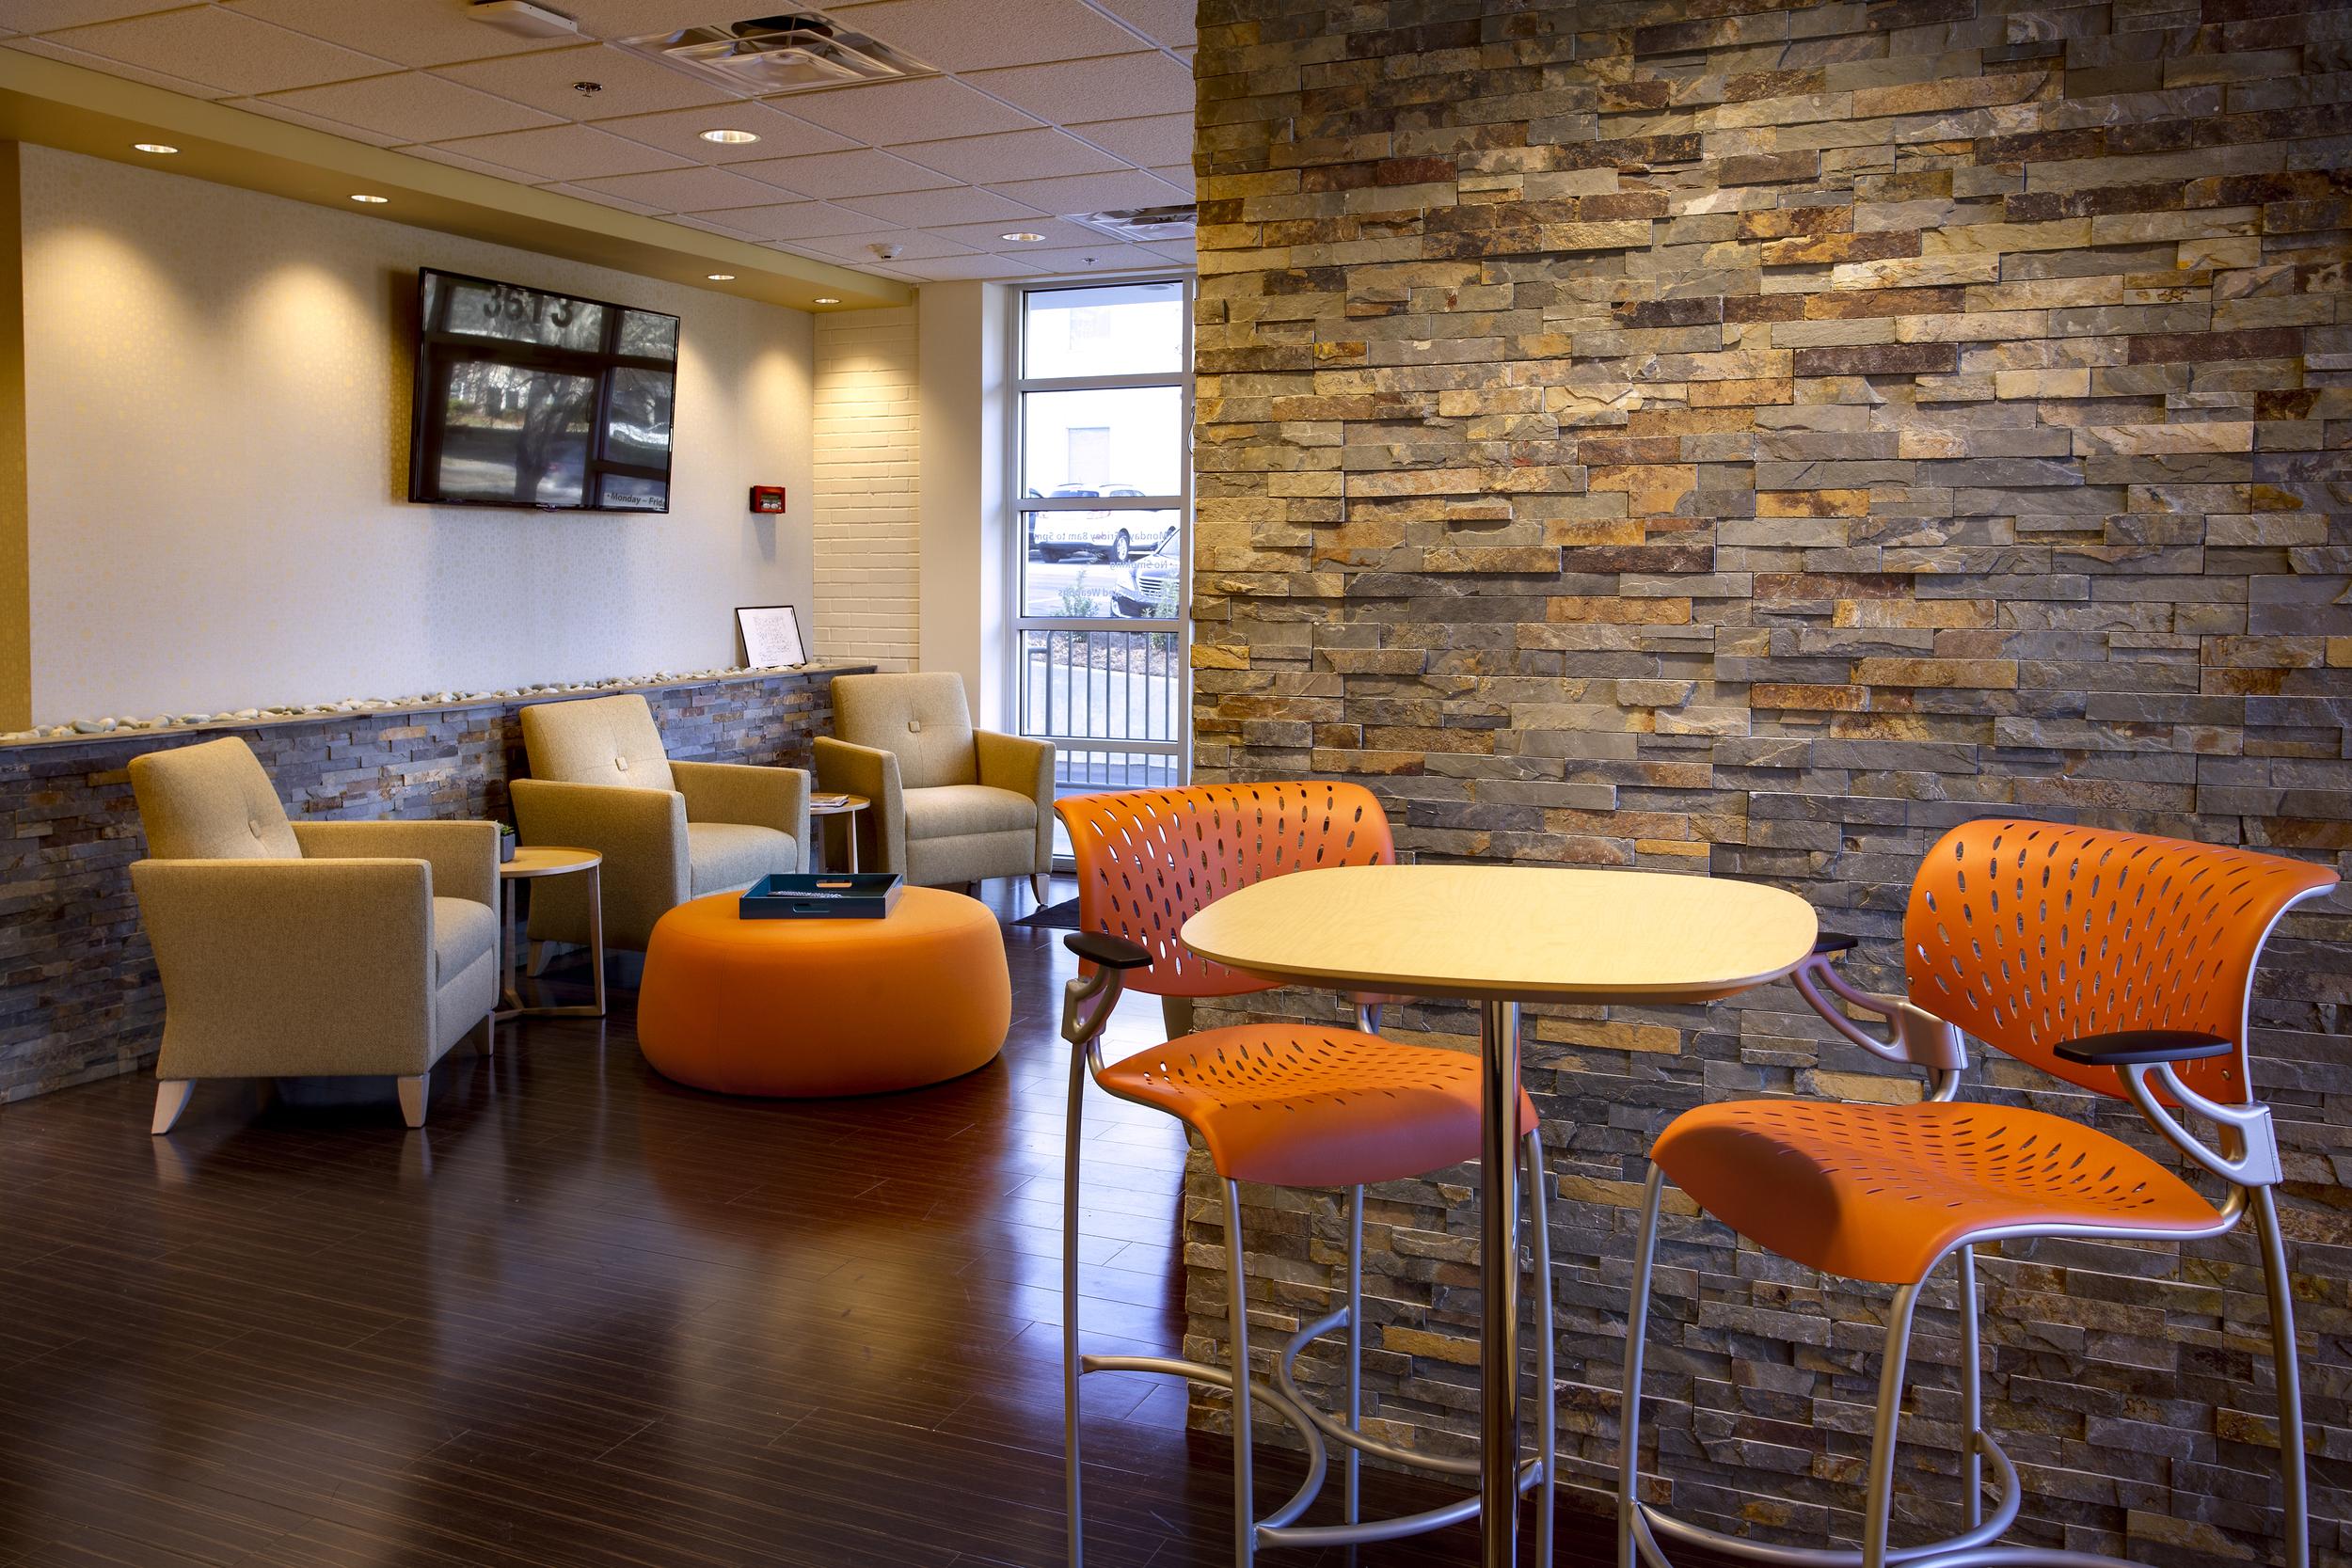 Dr-Monteith-Lobby-Orange-Chairs.jpg